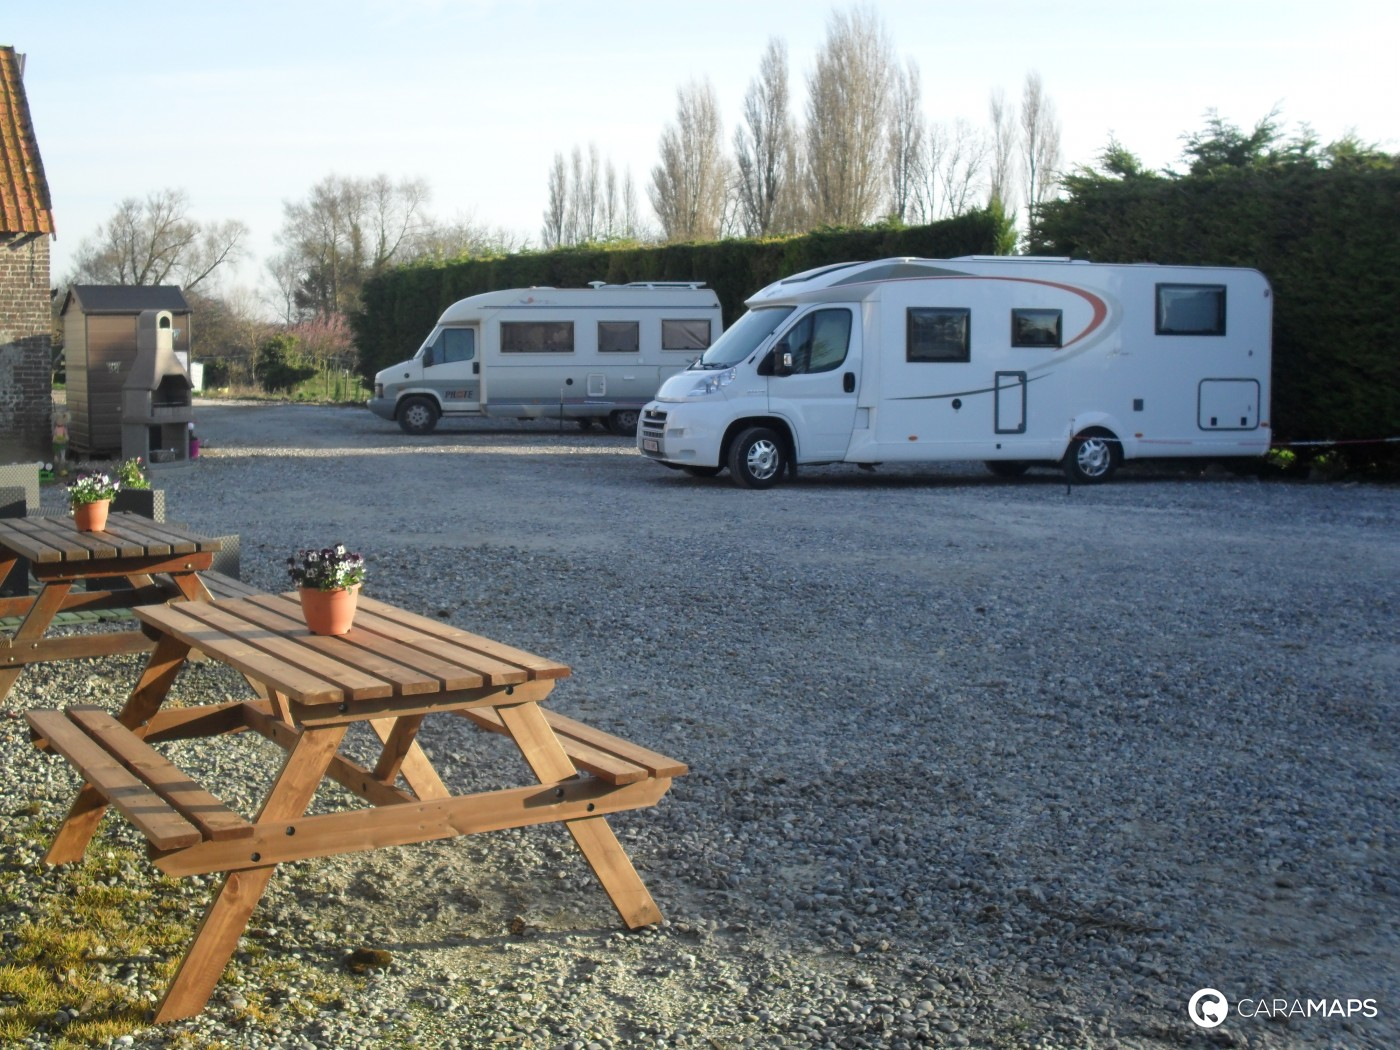 10 aree camper più accoglienti